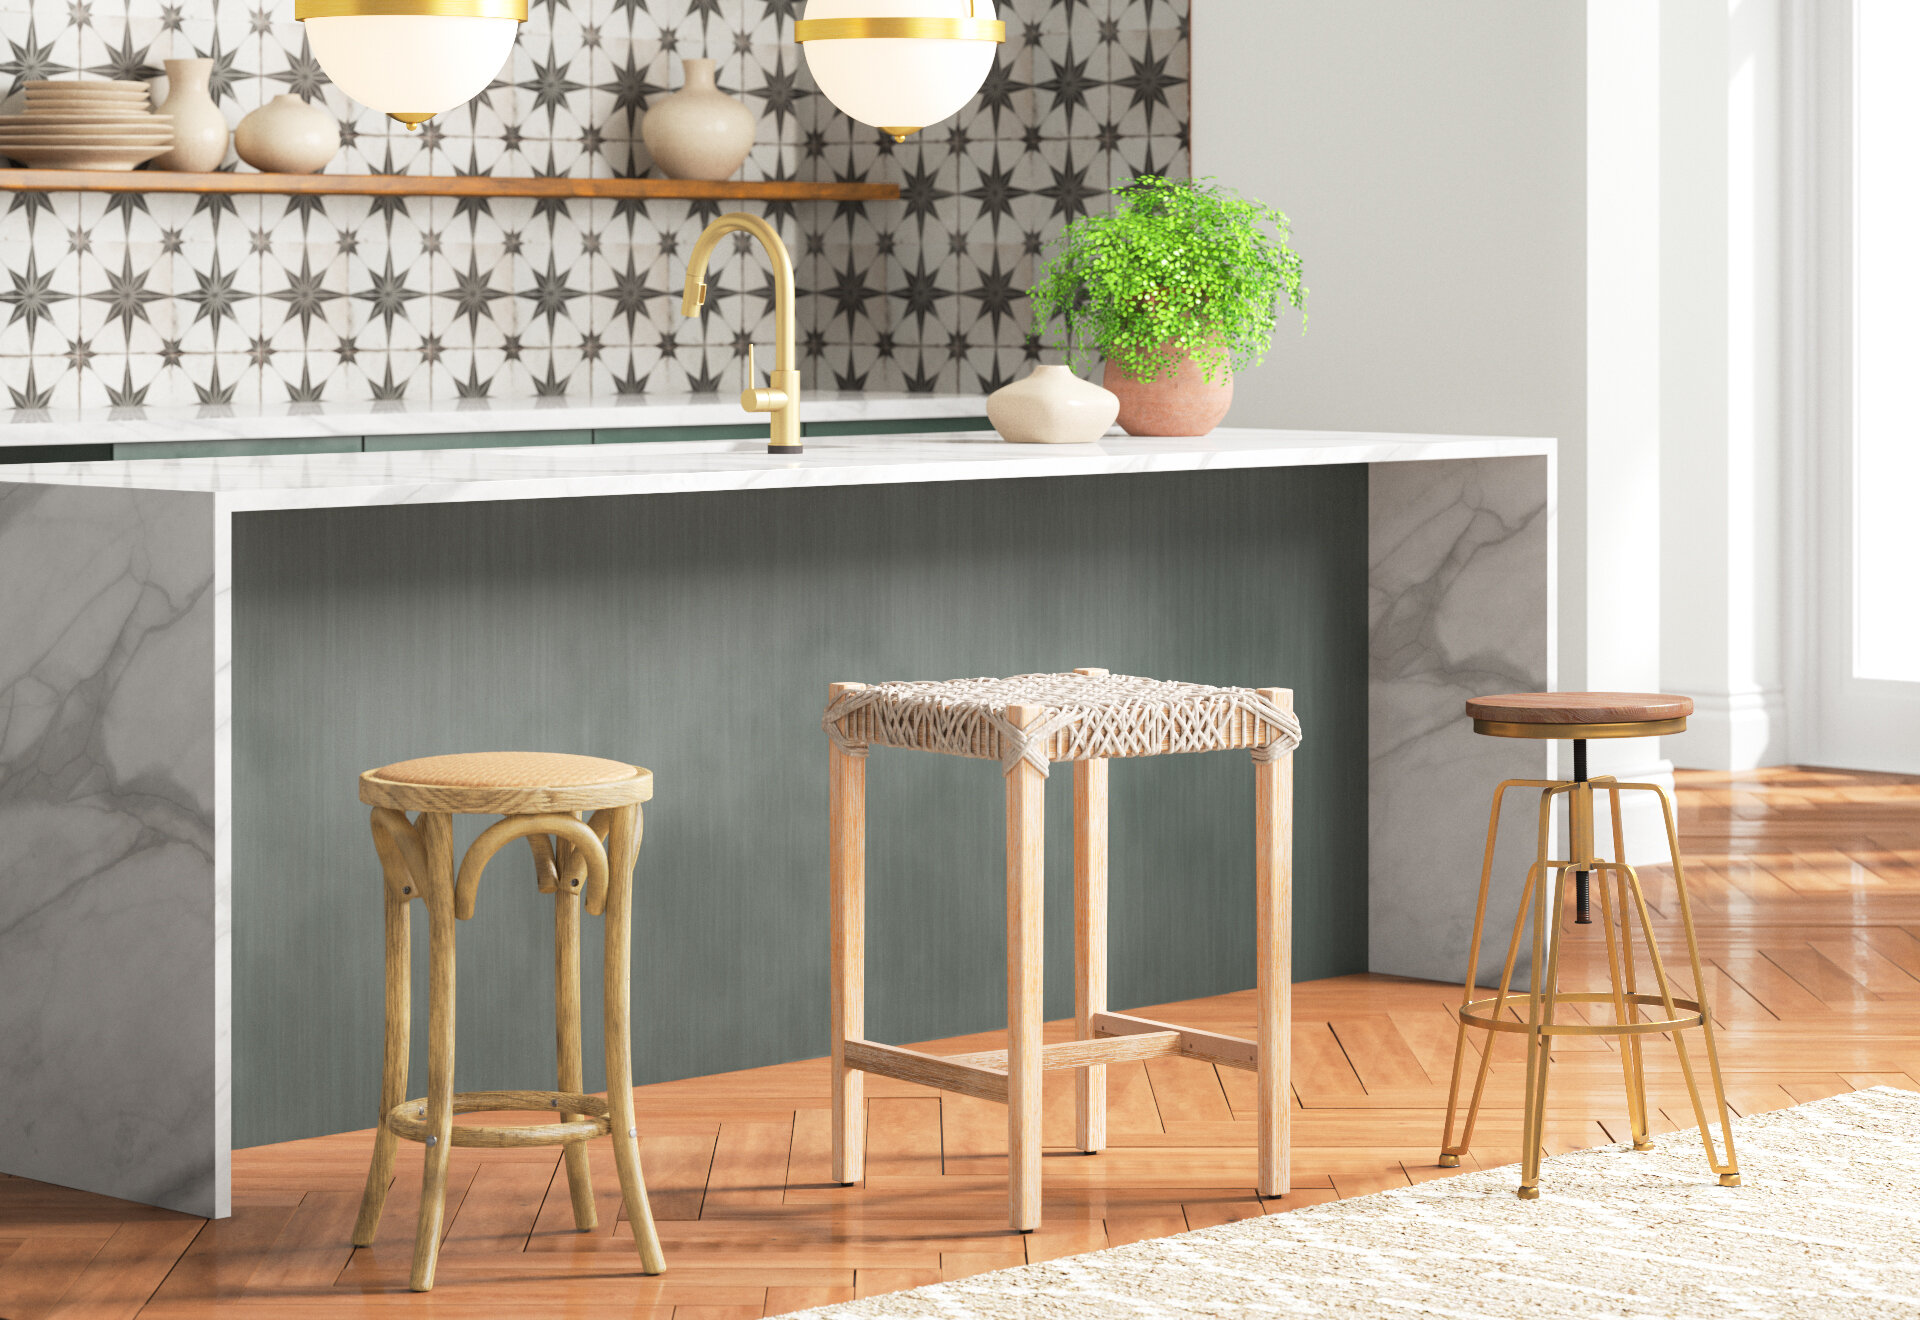 Kitchen Island Decorating Ideas In 3 Easy Steps Joss Main